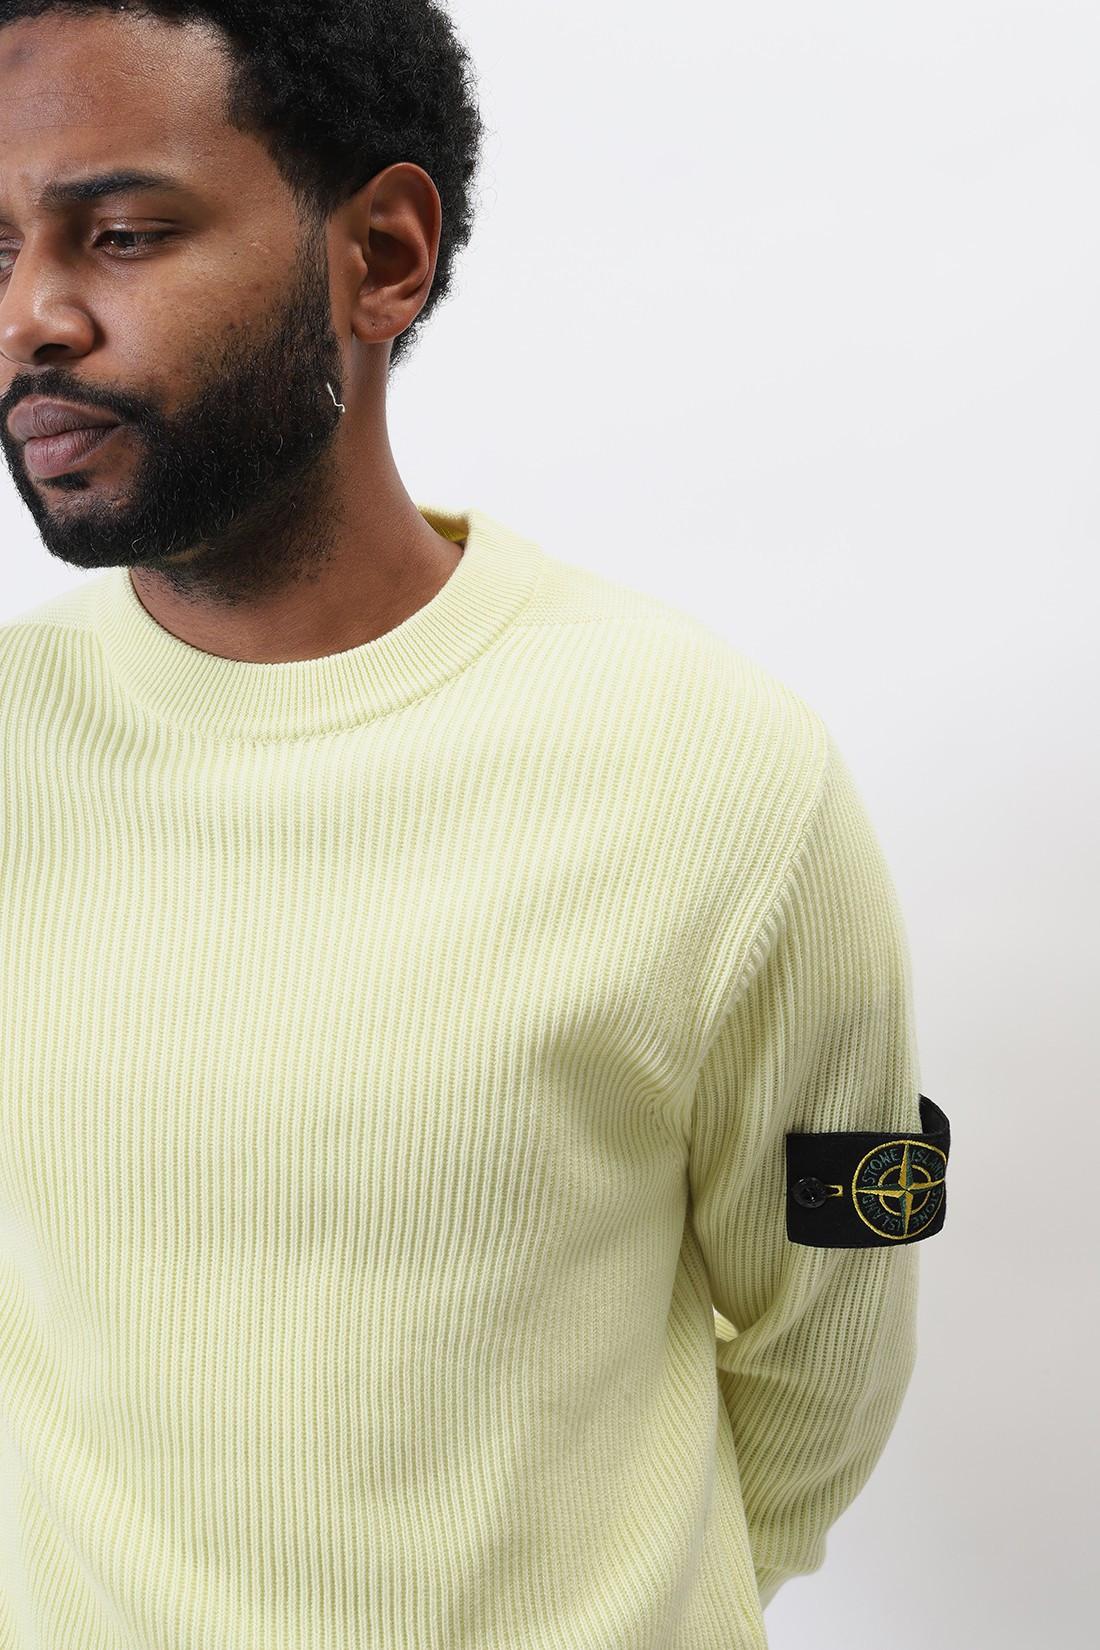 STONE ISLAND / 552d8 crewneck knitwear v0031 Limone